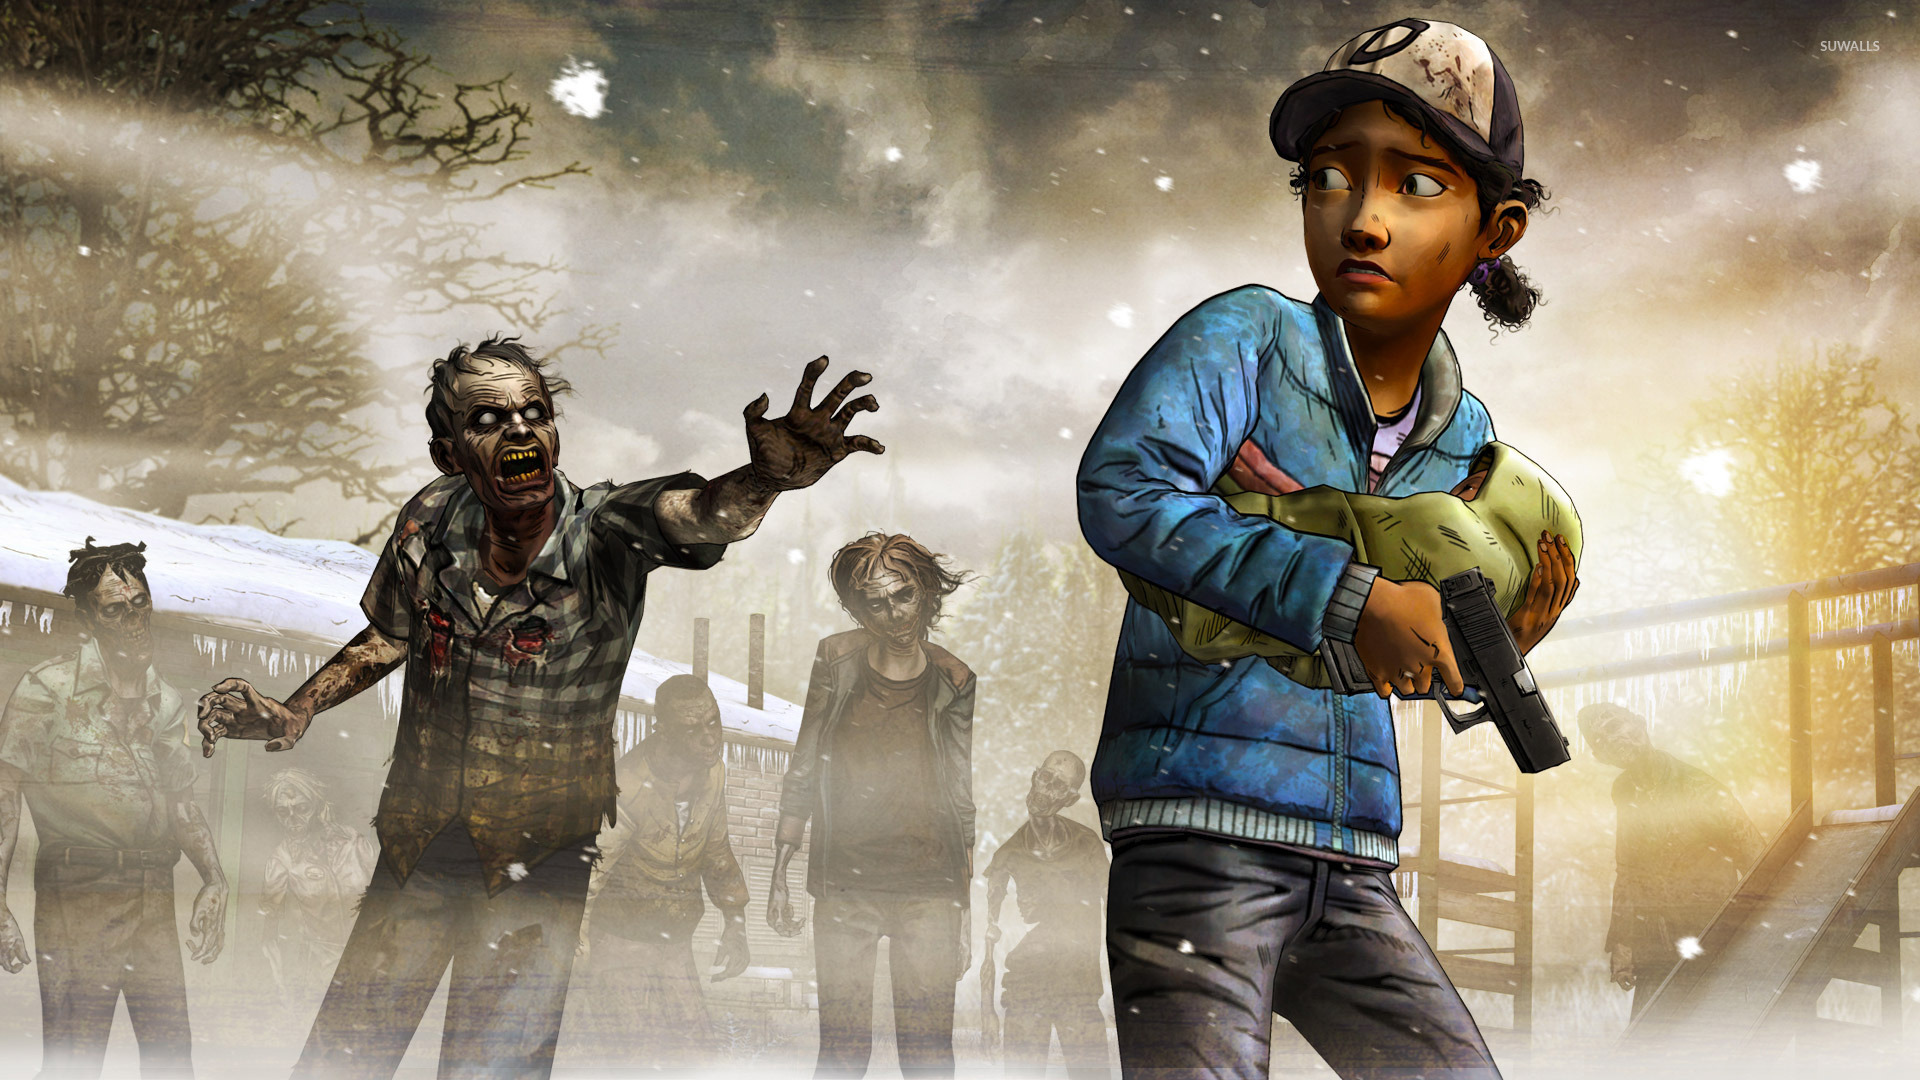 Clementine The Walking Dead Season Two Wallpaper Game